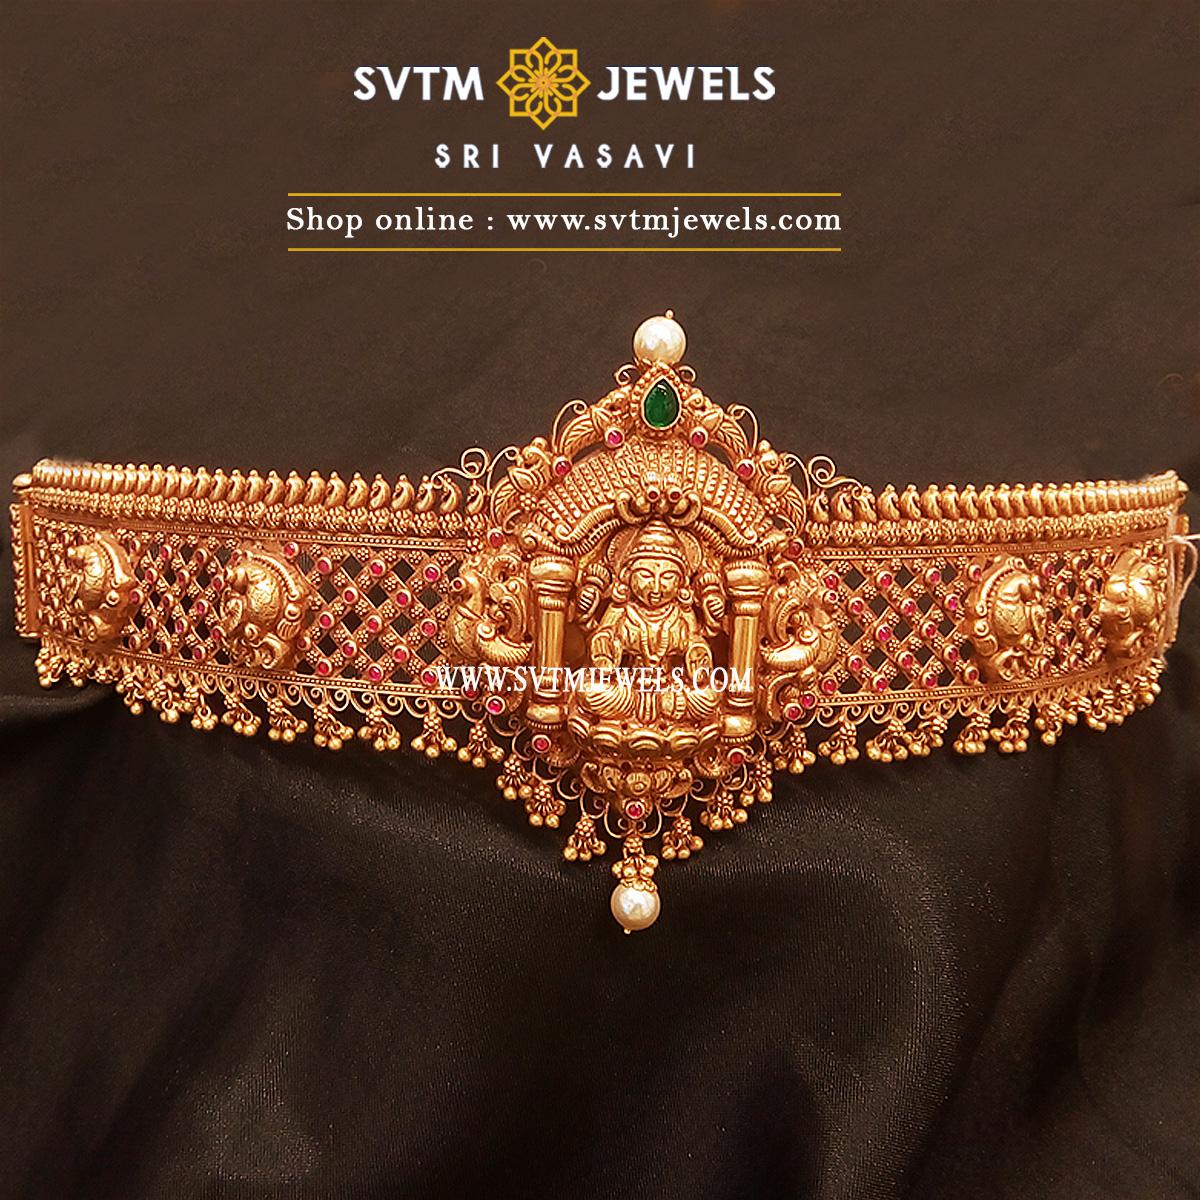 vaddanam-ottiyanam-hip-belt-designs (15)